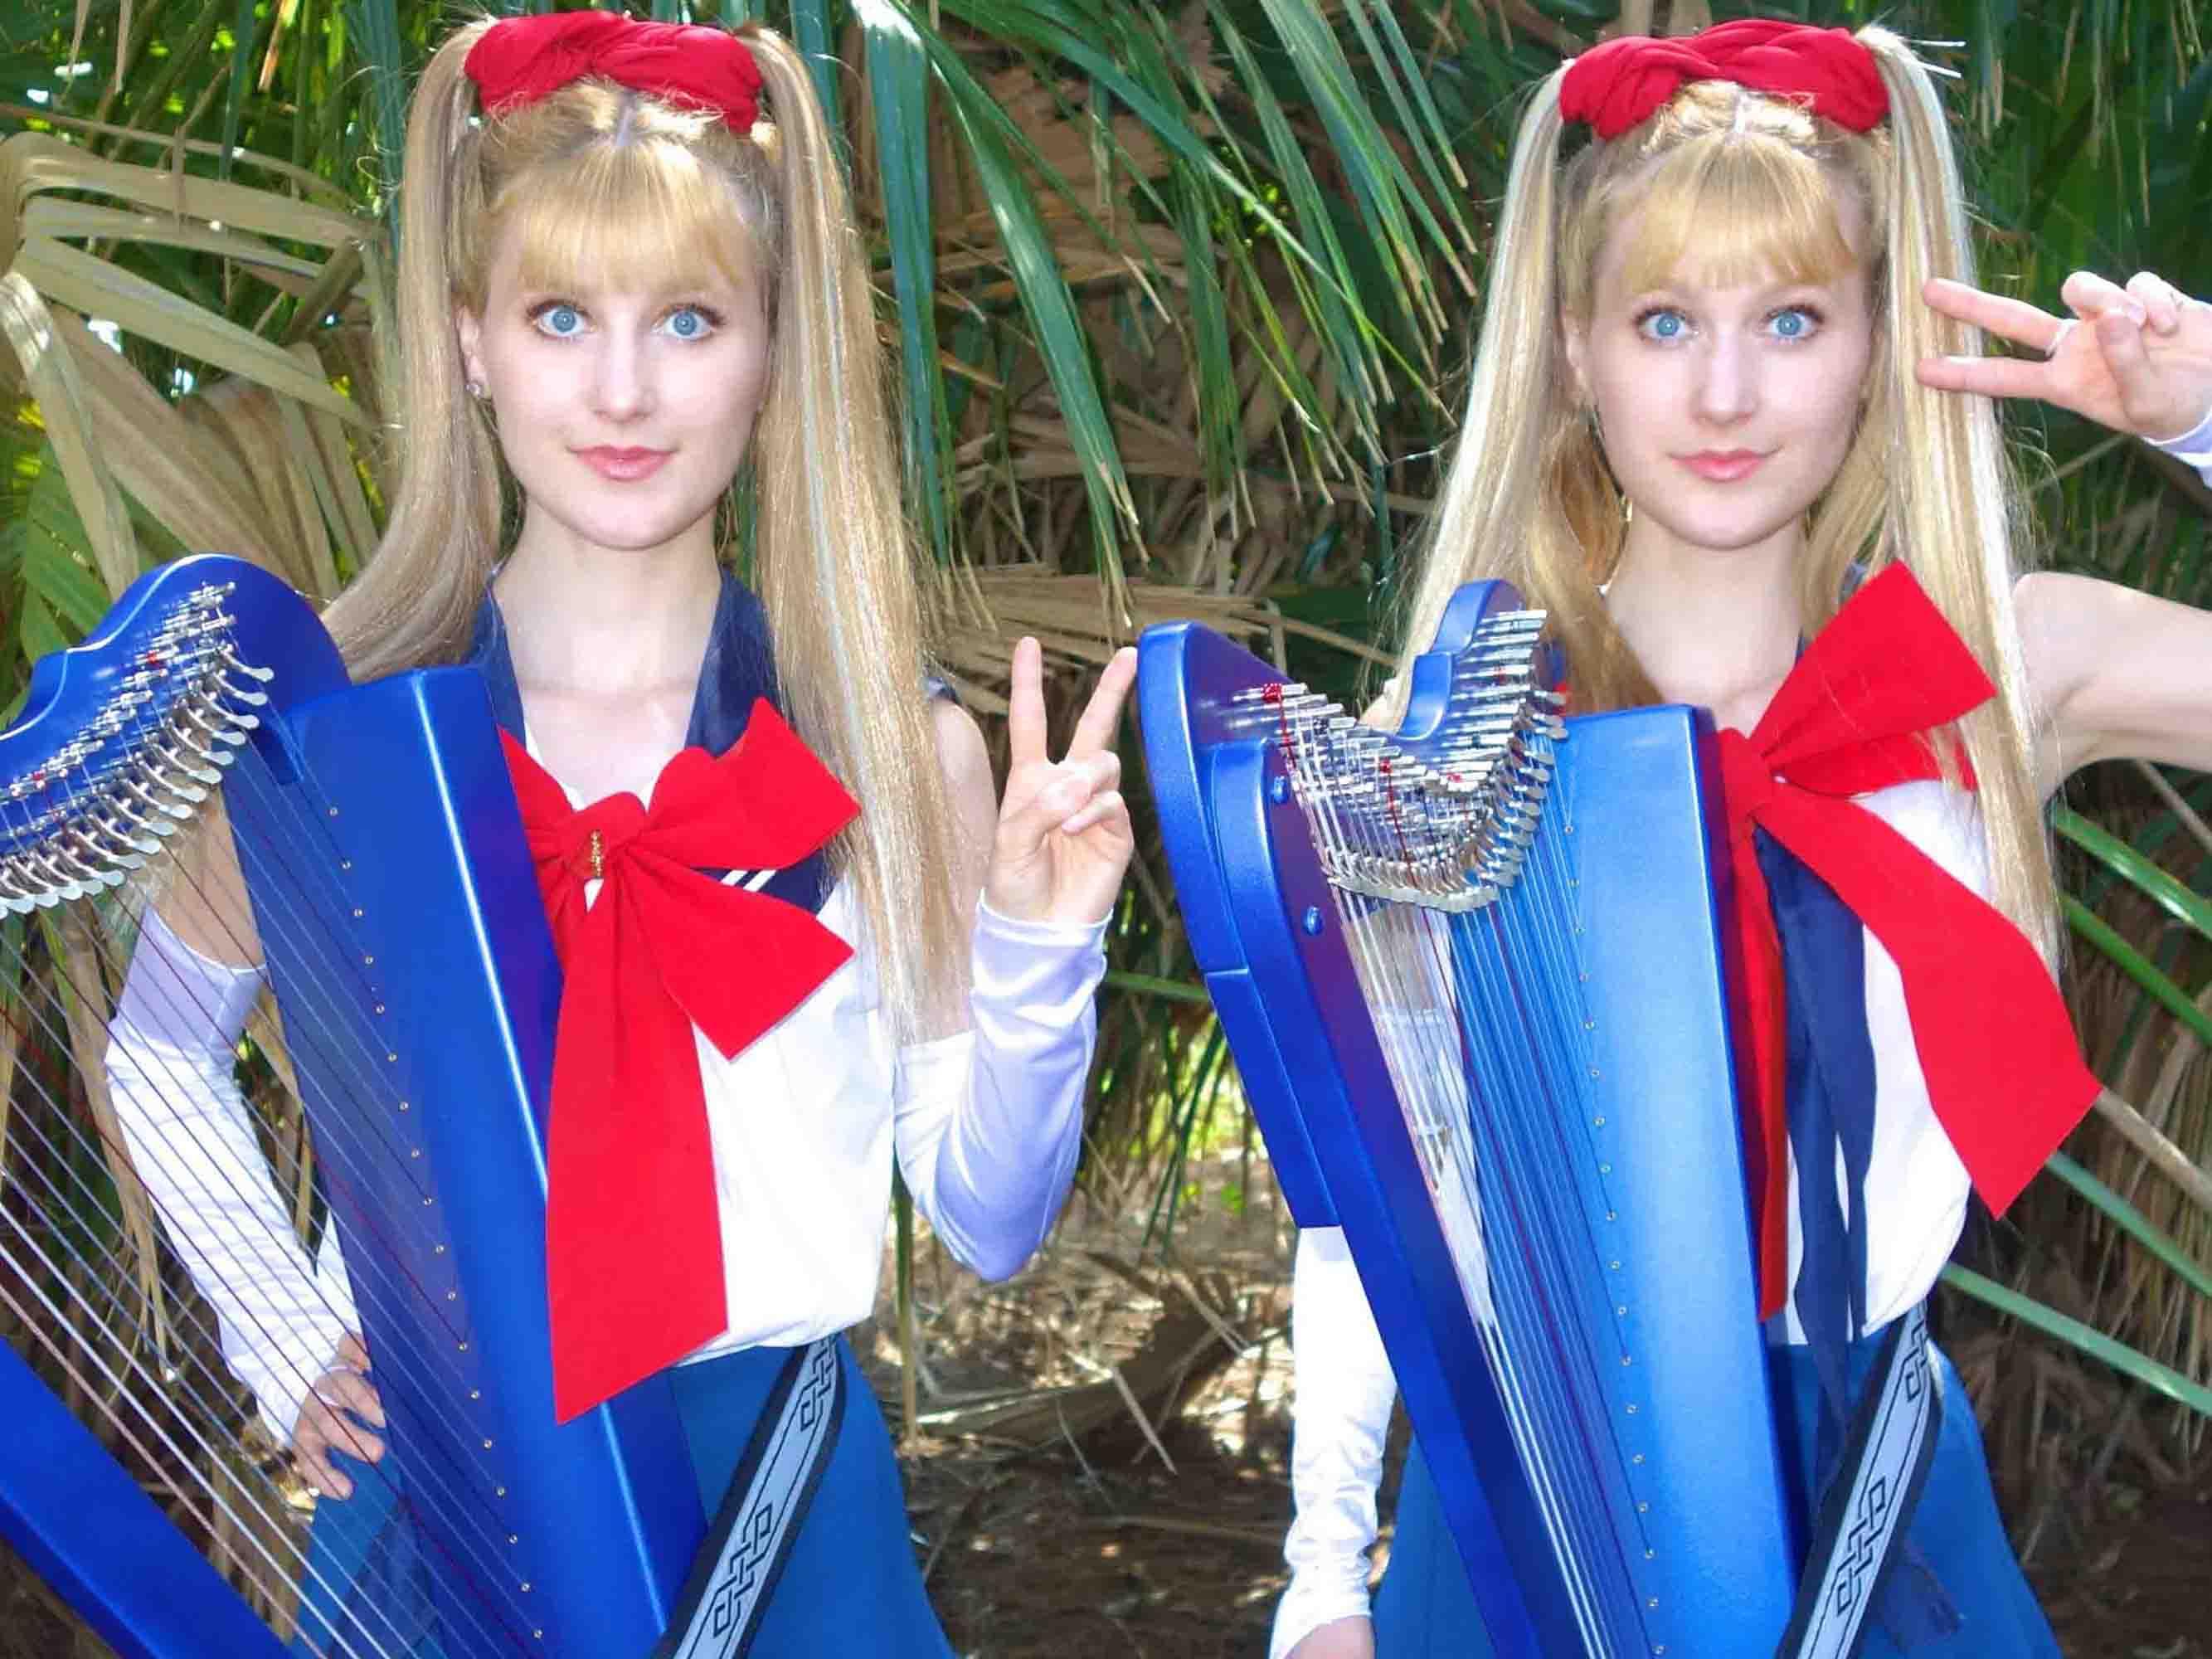 Kenalan Dengan Camile dan Kennerly, Kembar Identik yang Meng-Cover Lagu dengan Harpa!